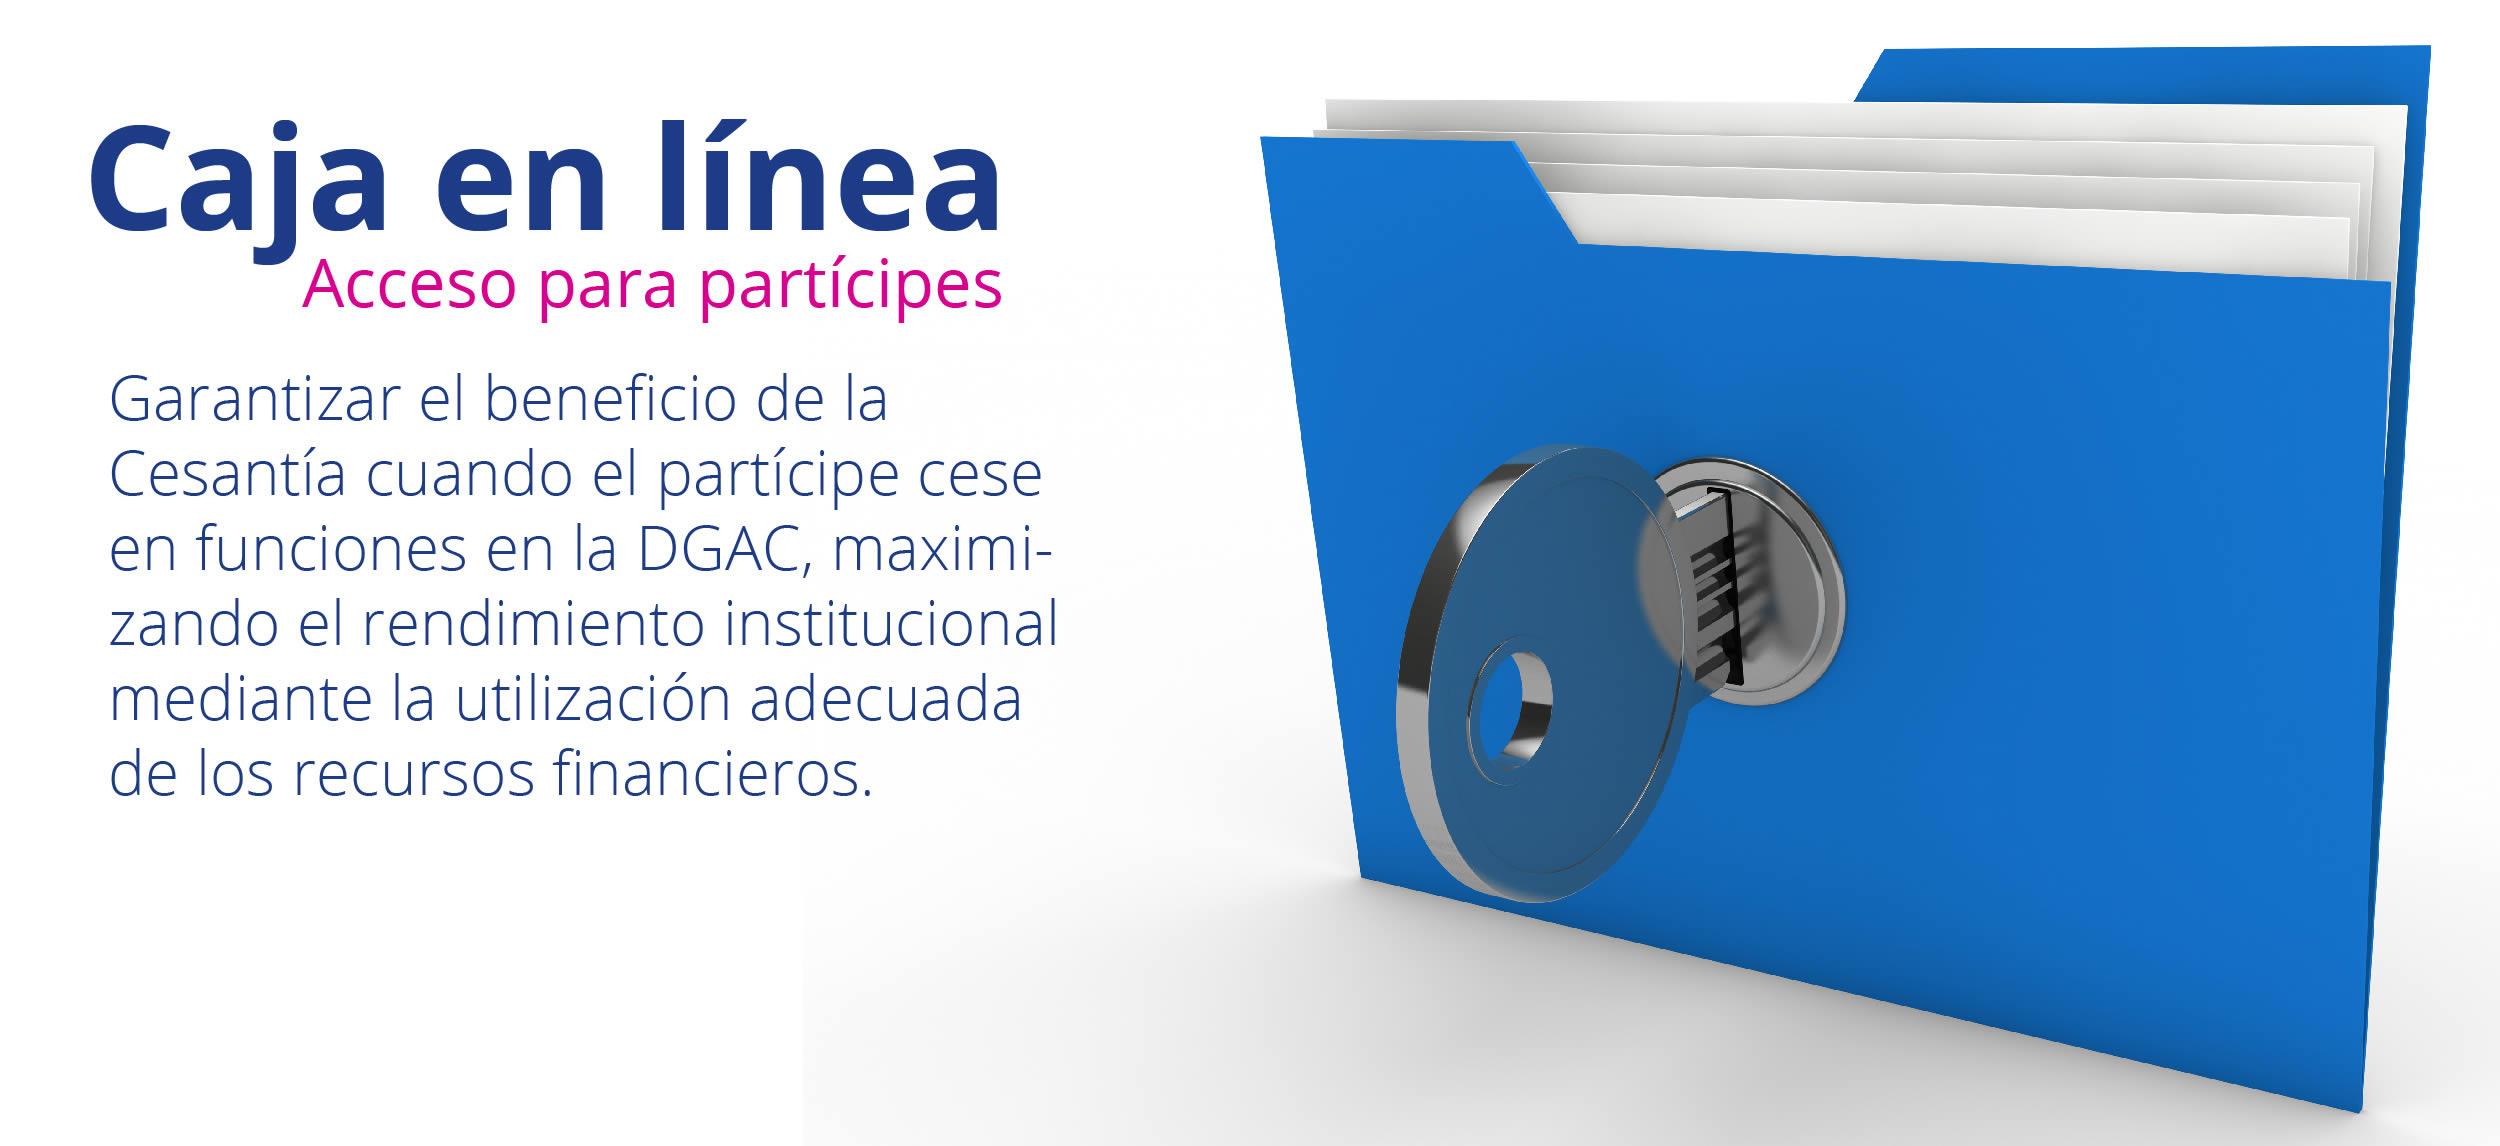 slide-caja-en-linea